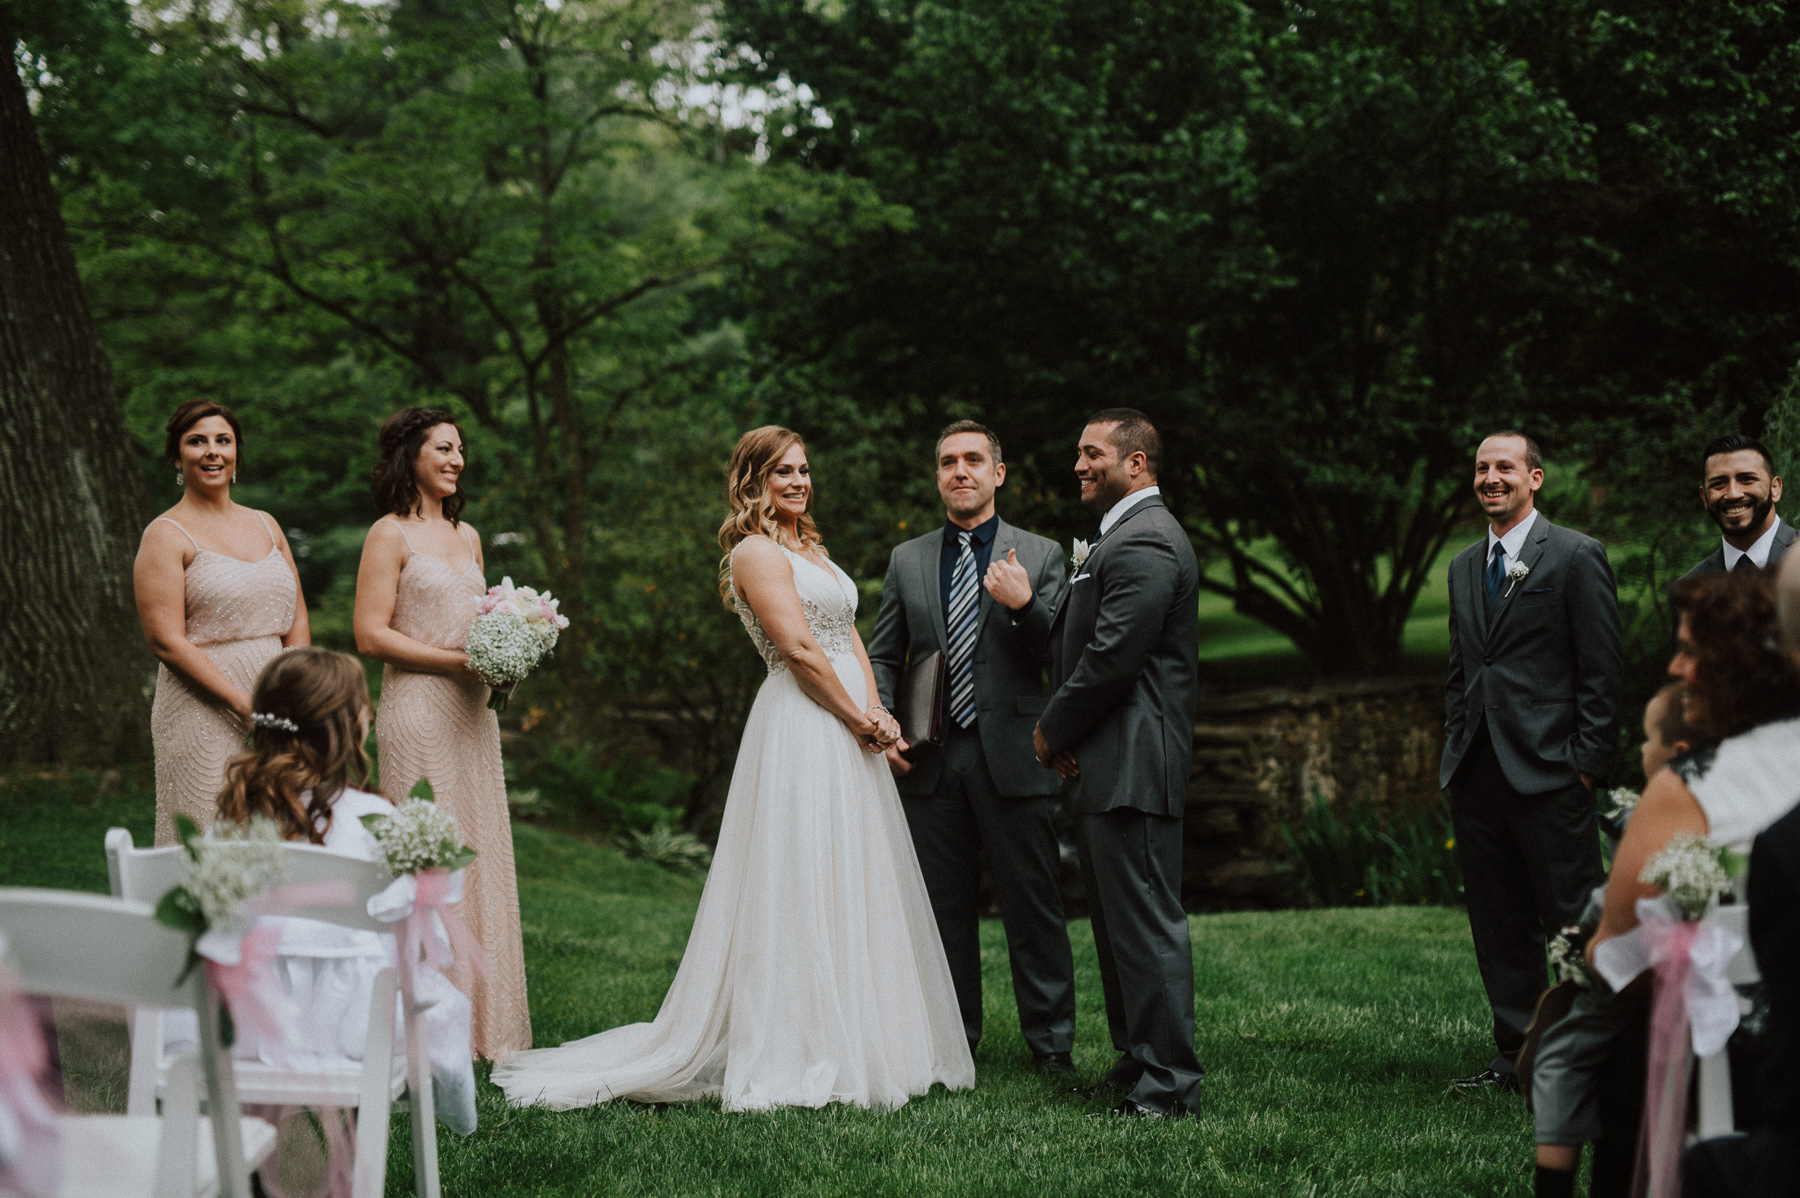 appleford-estate-wedding-photography-65.jpg